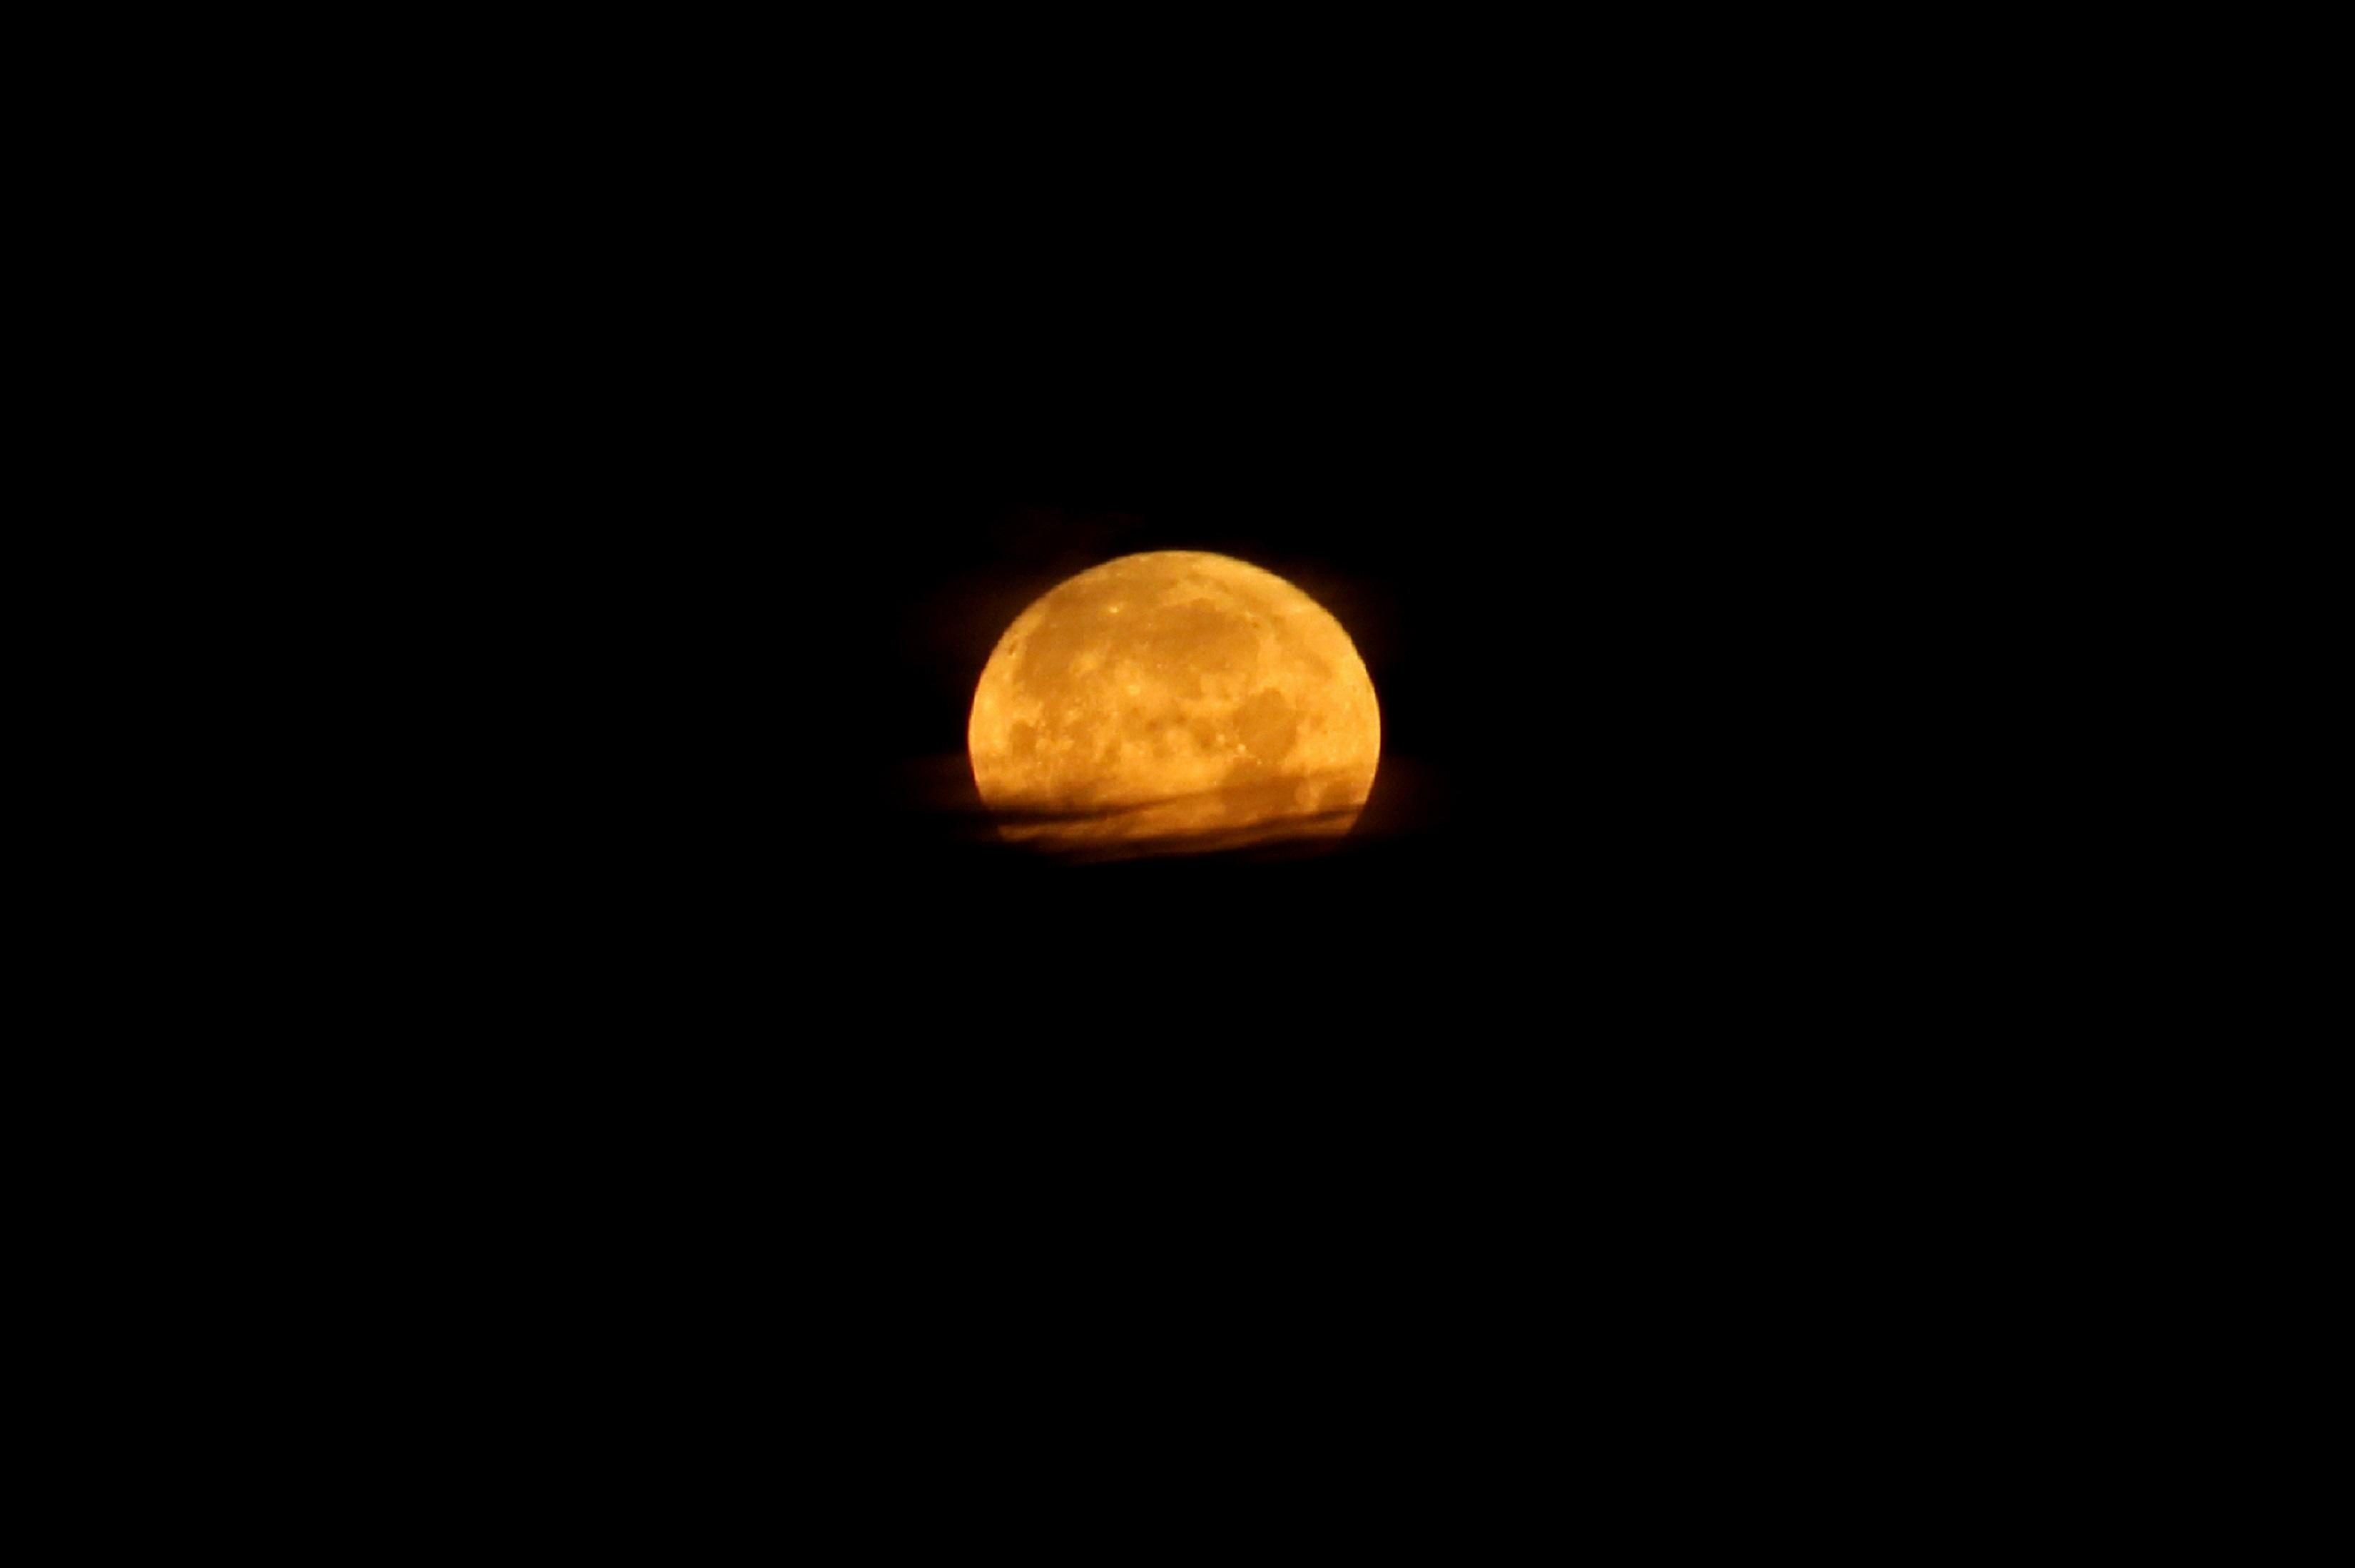 Full Moon, Dark, Full, Moon, Nature, HQ Photo